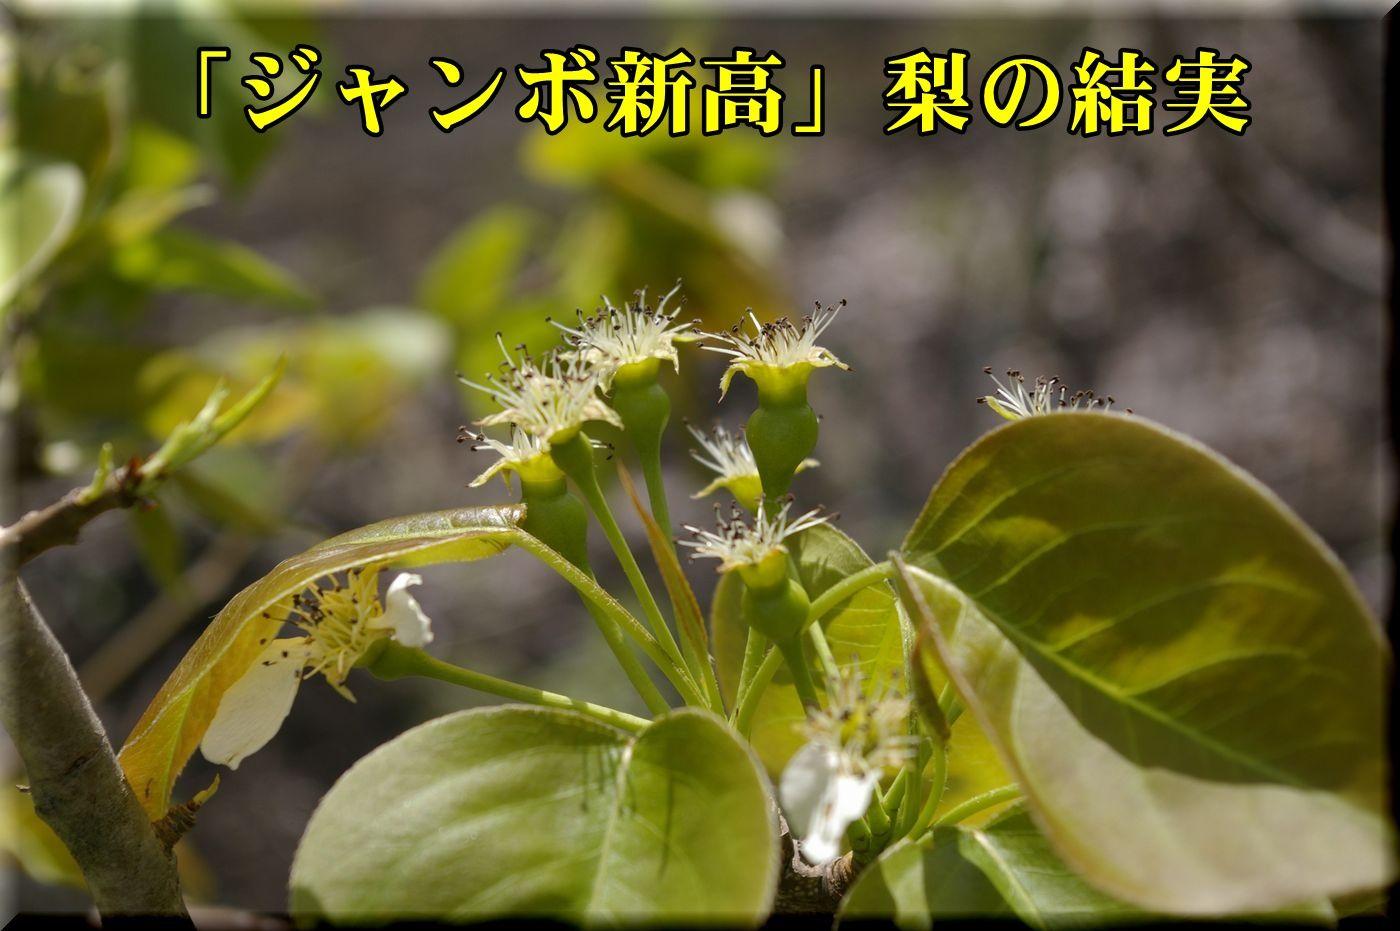 1Jnitaka160418_001.jpg